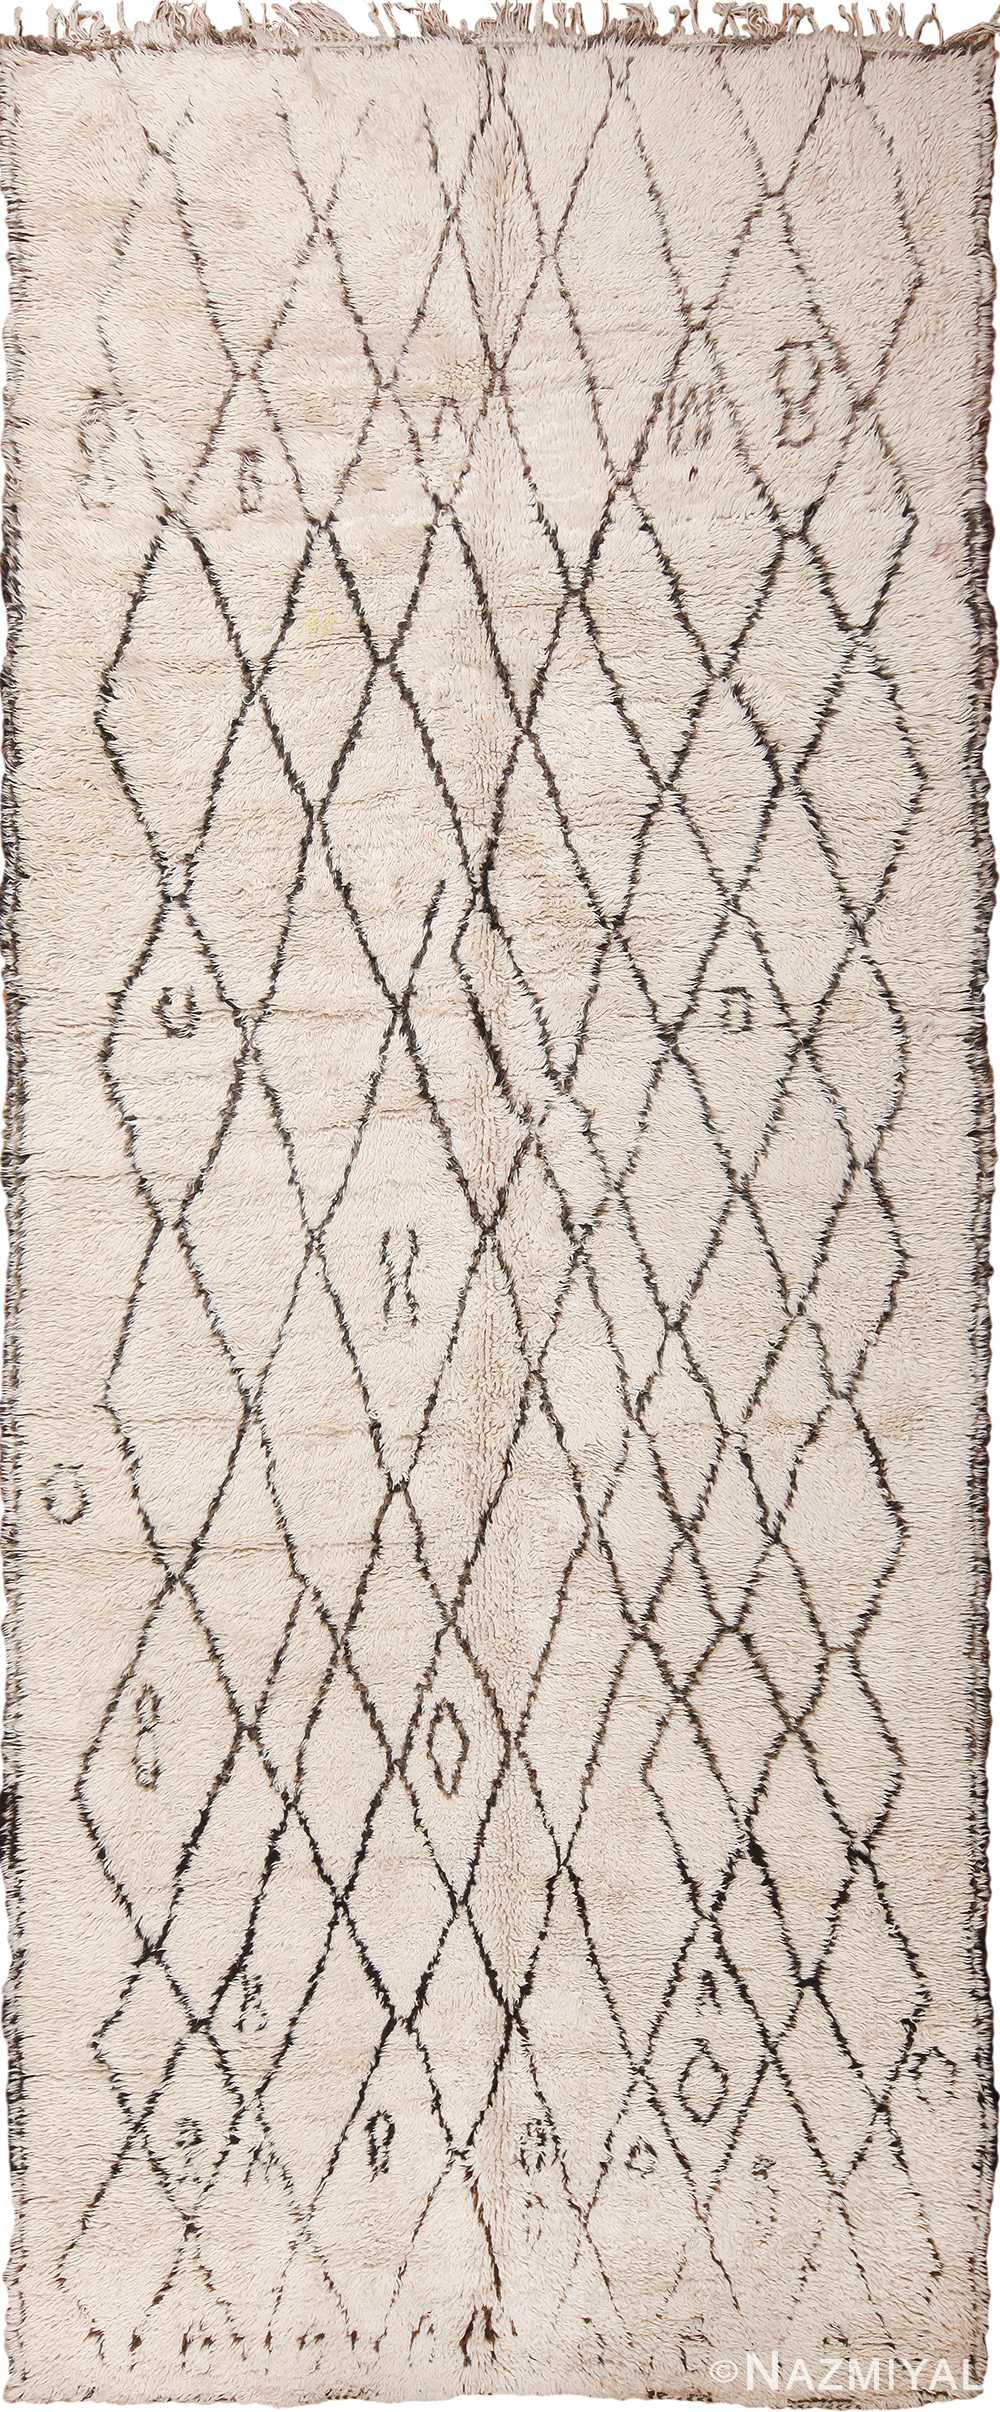 Gallery Size Vintage Moroccan Beni Ourain Rug 49895 - Nazmiyal